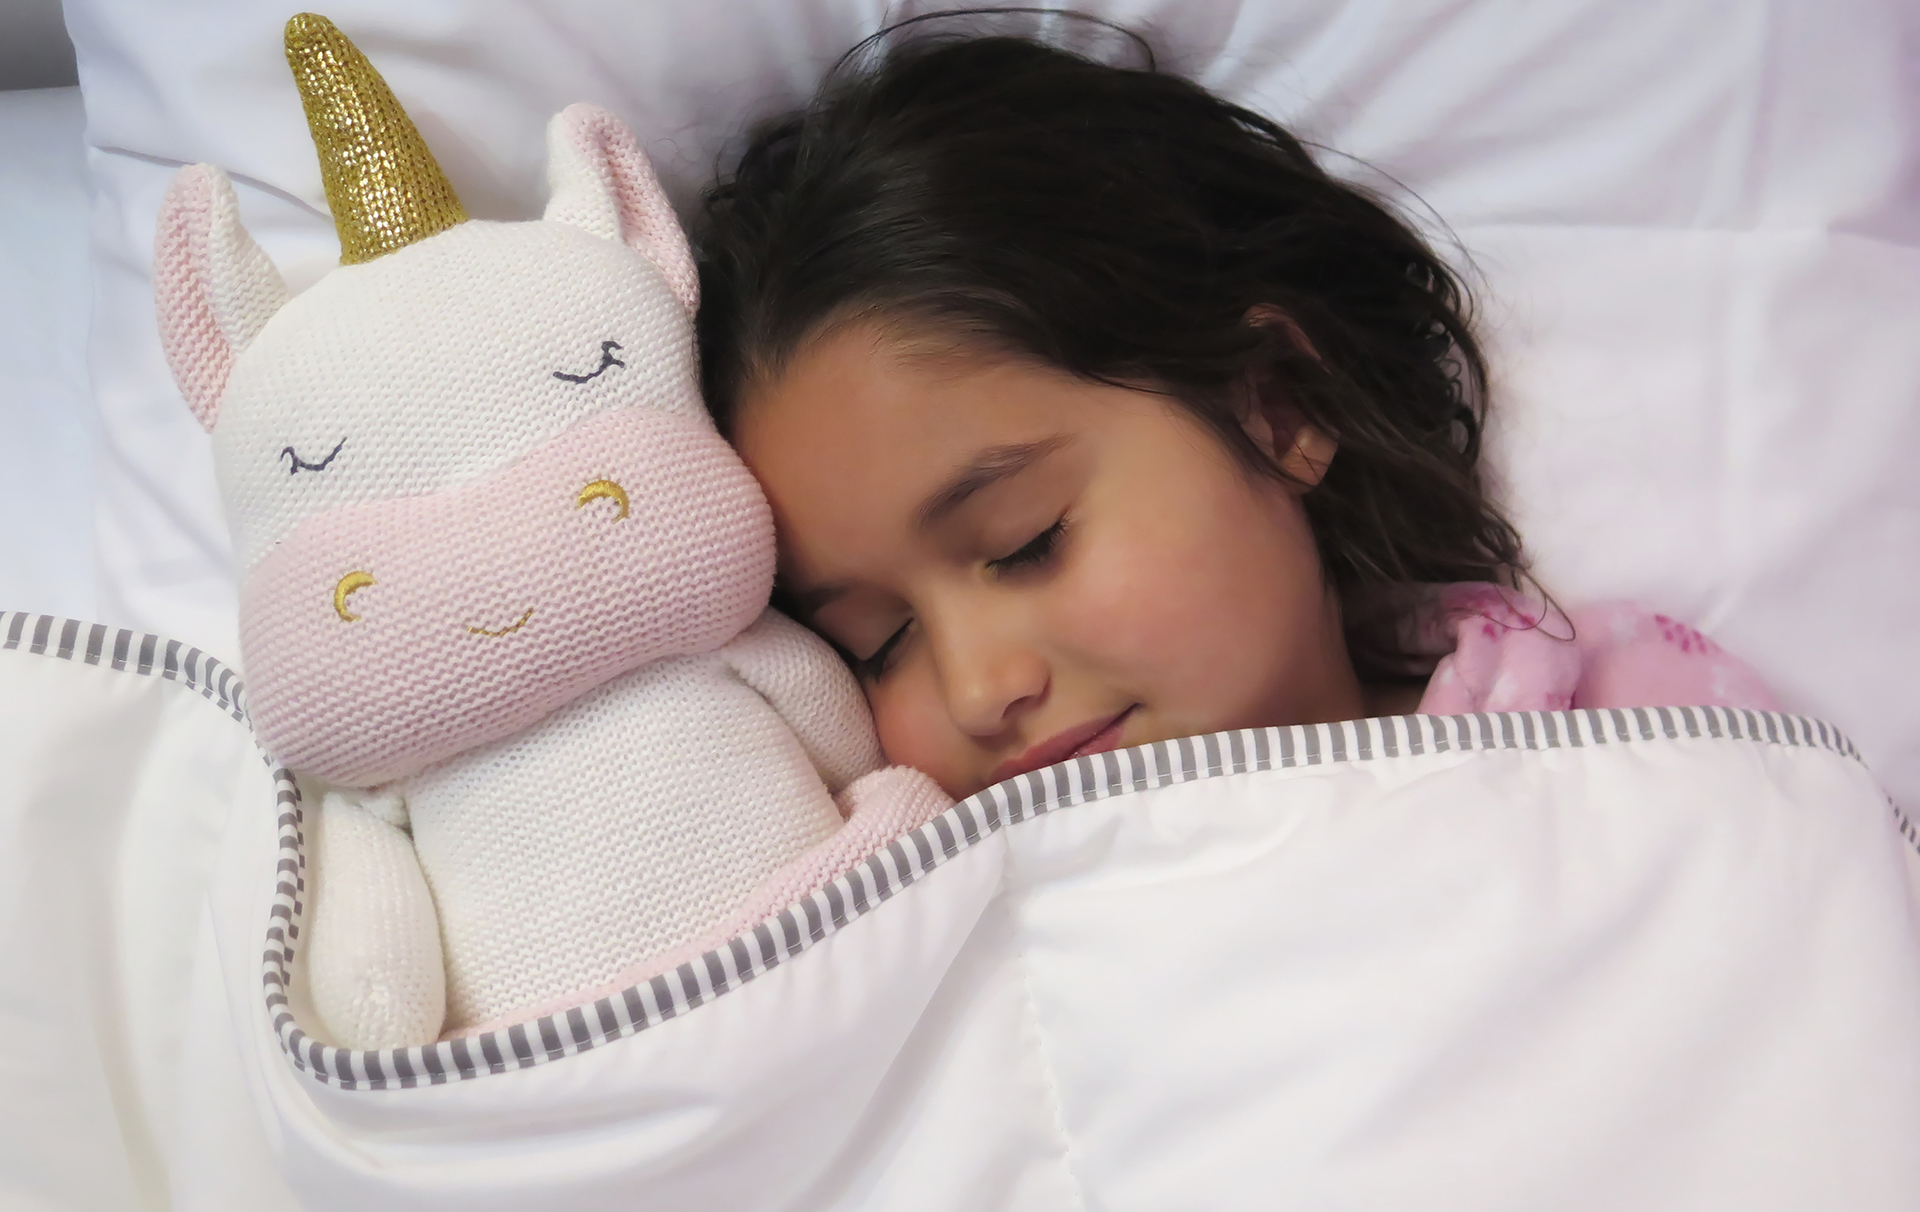 b&m hooded unicorn blanket